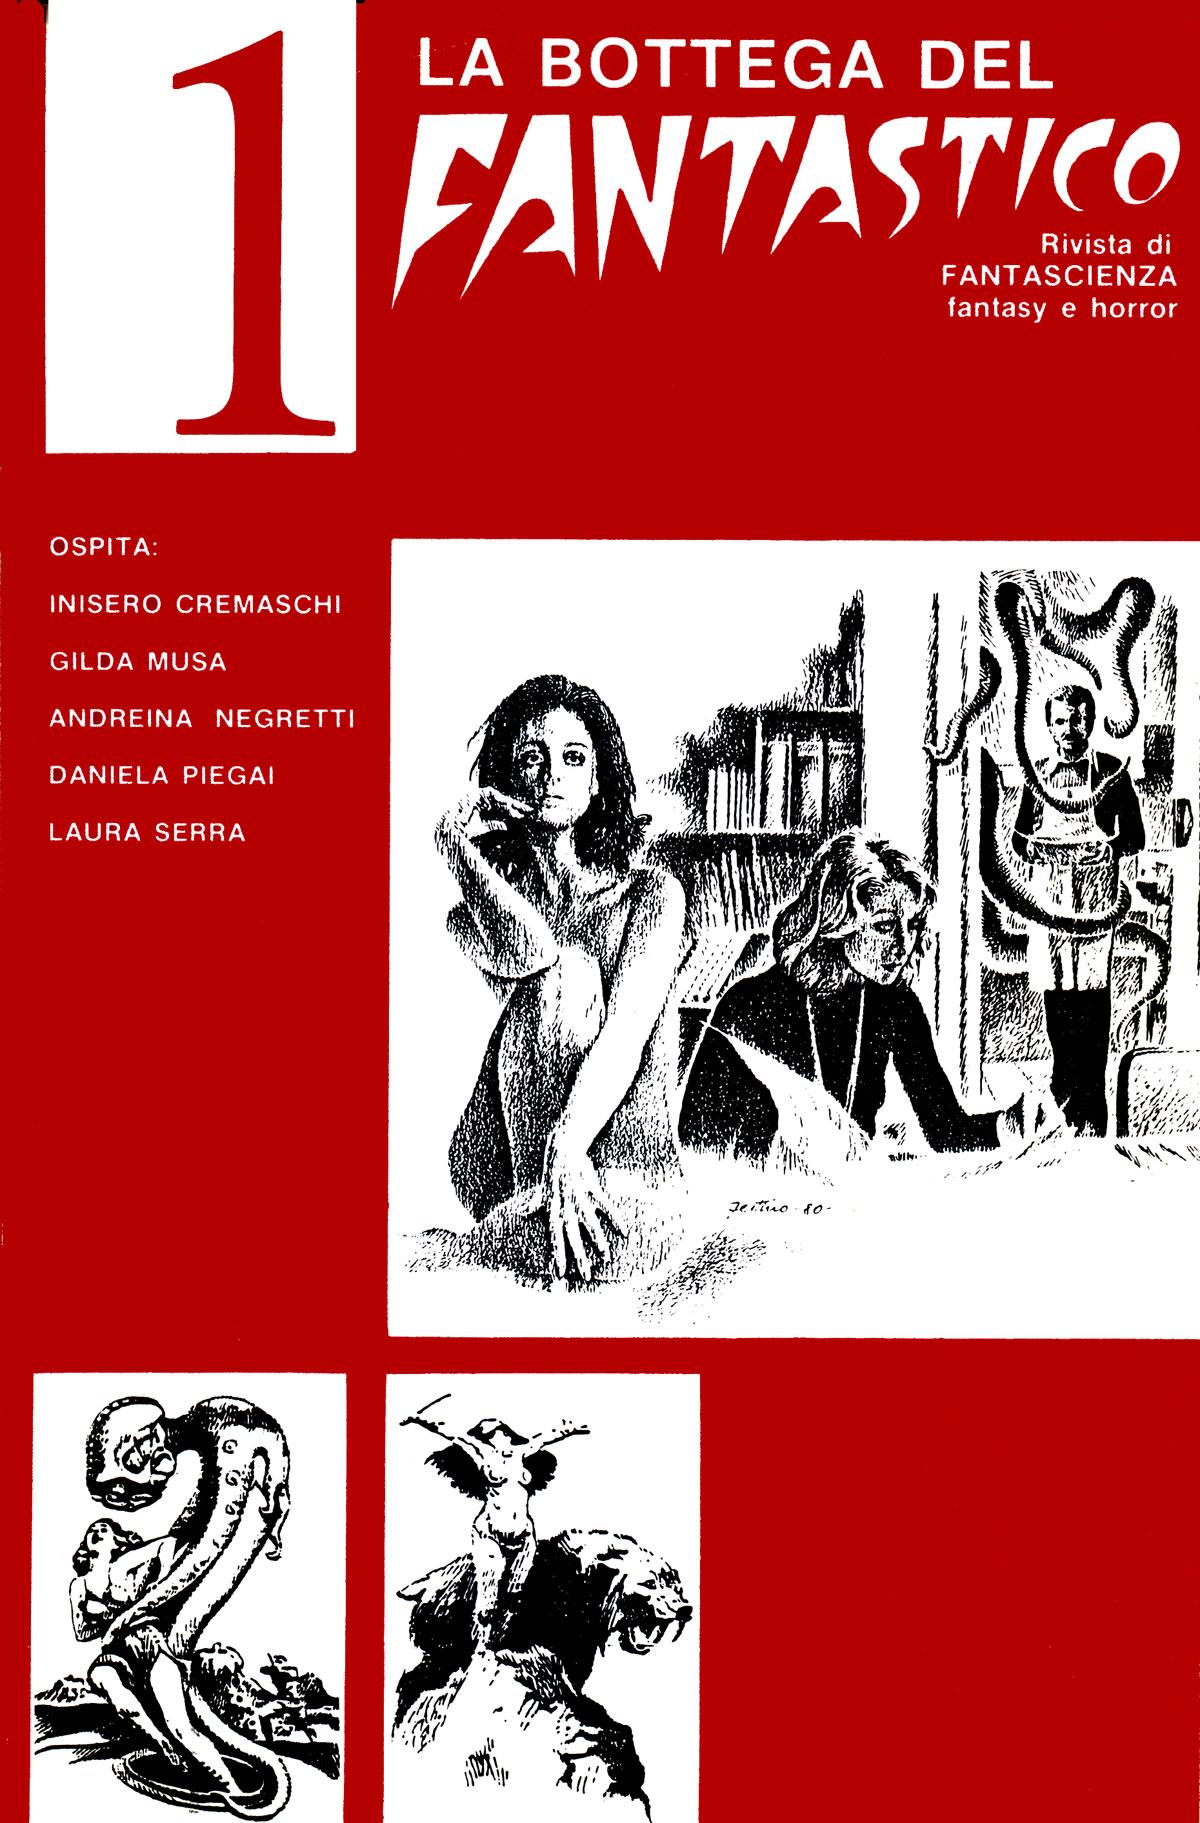 8 marzo: La donna, ne La Bottega del Fantastico